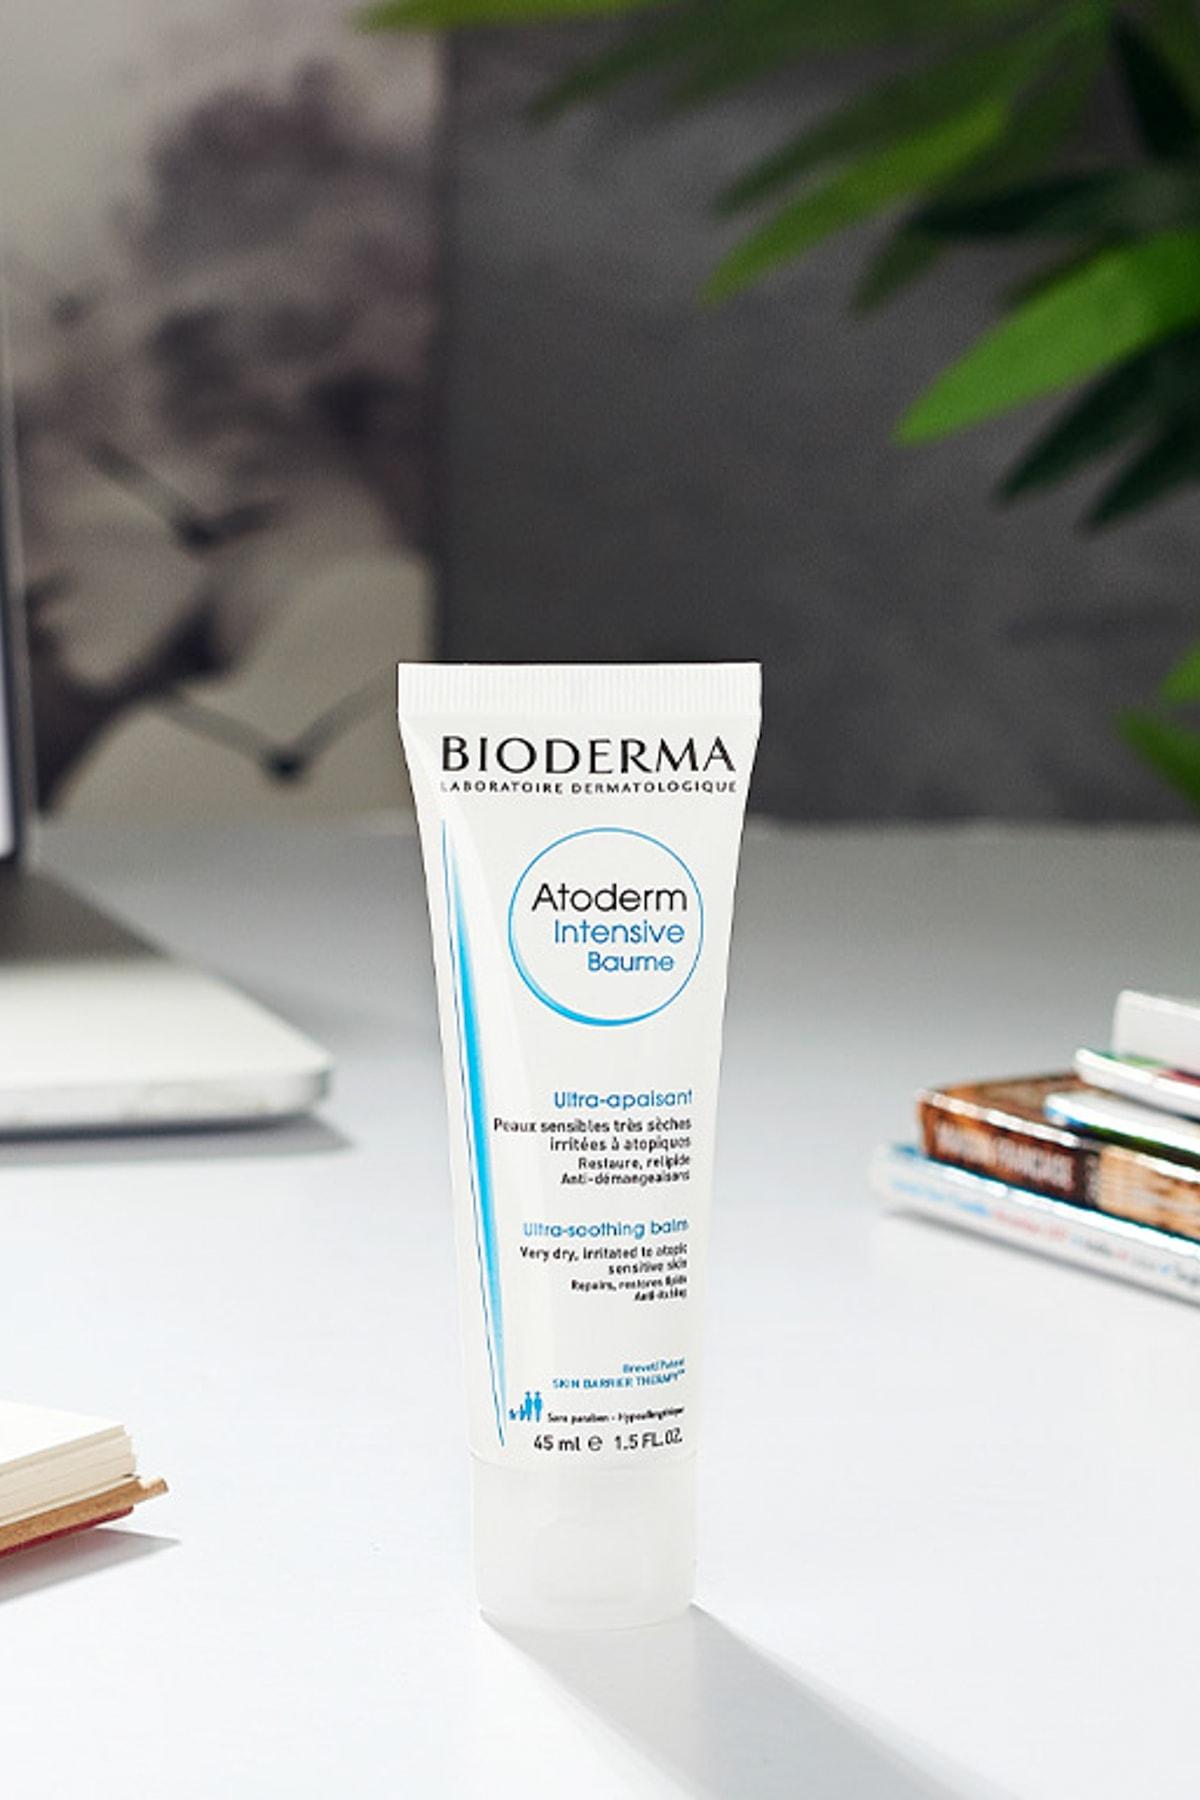 Bioderma Atoderm Intensive Balm 45 ml 2